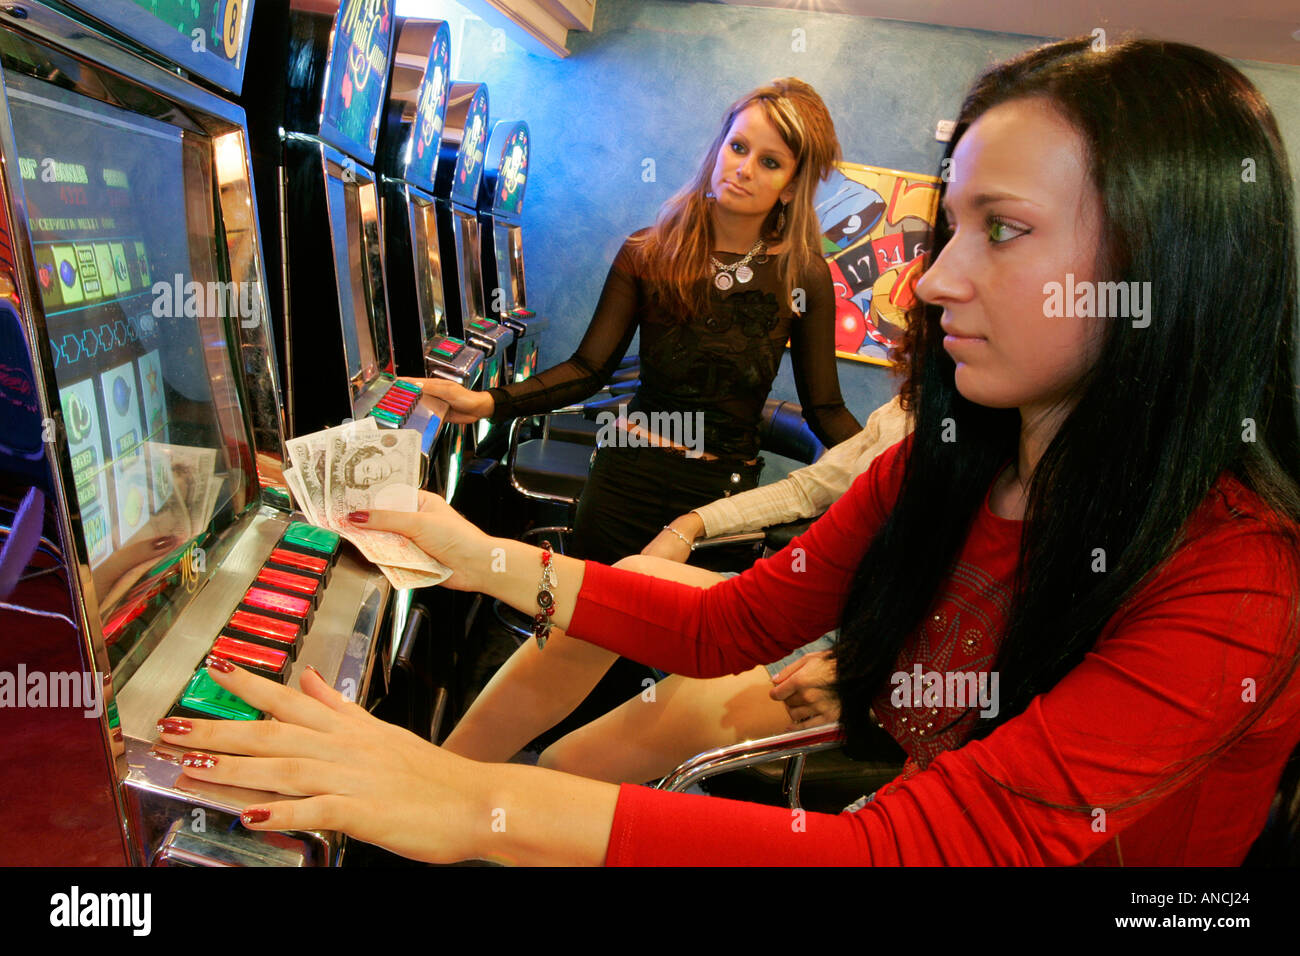 Online Roulette Azartsclub